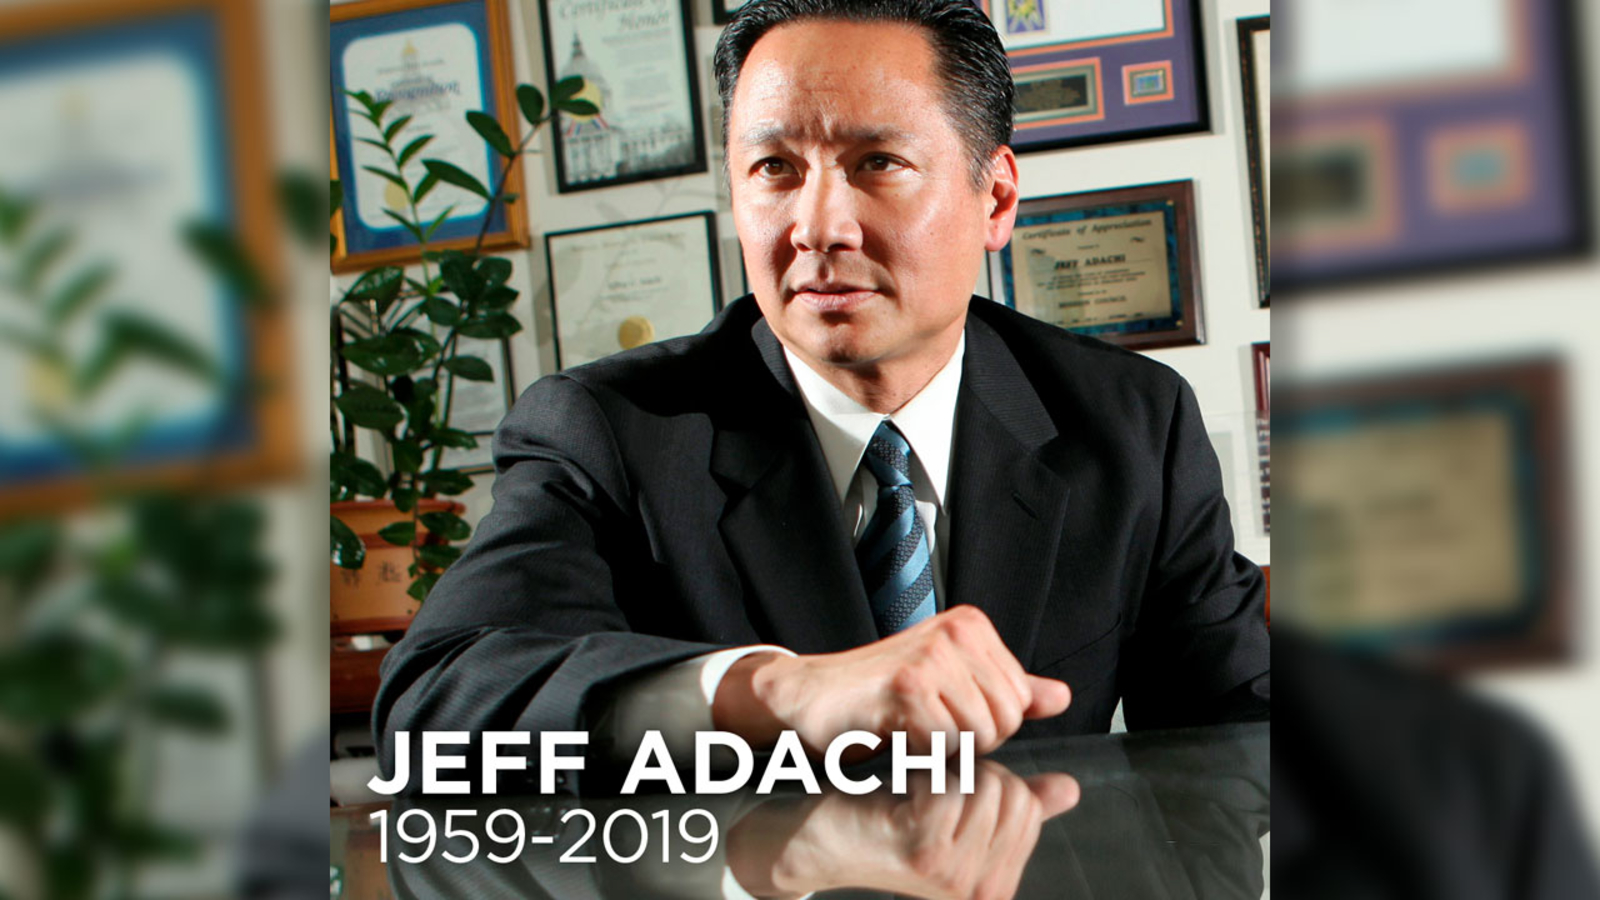 San Francisco Public Defender Jeff Adachi has died, sources say